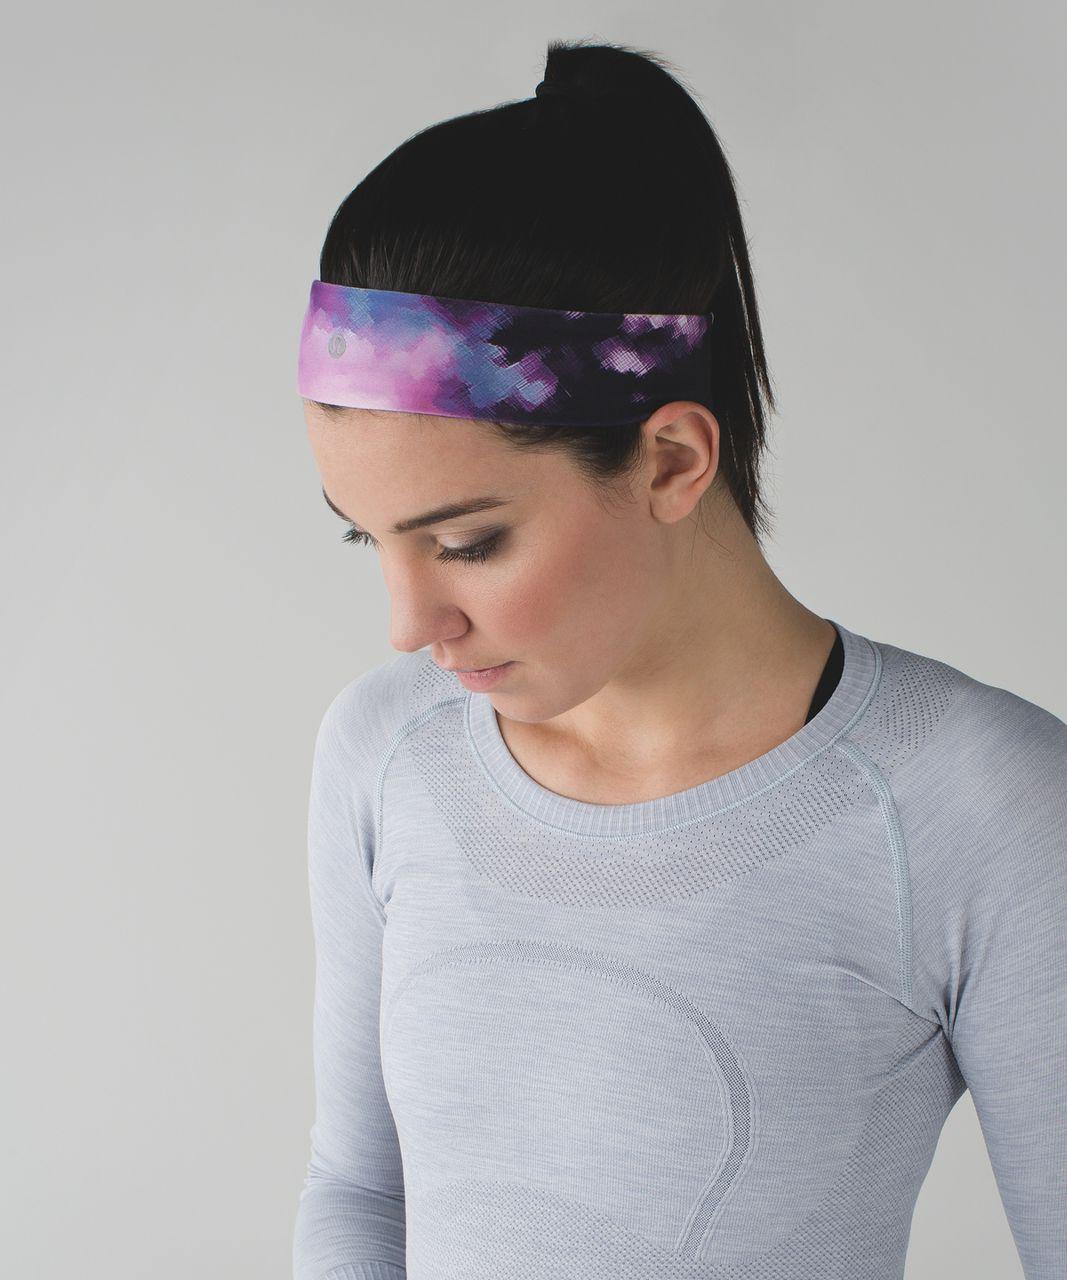 Lululemon Fly Away Tamer Headband II - Blooming Pixie Multi